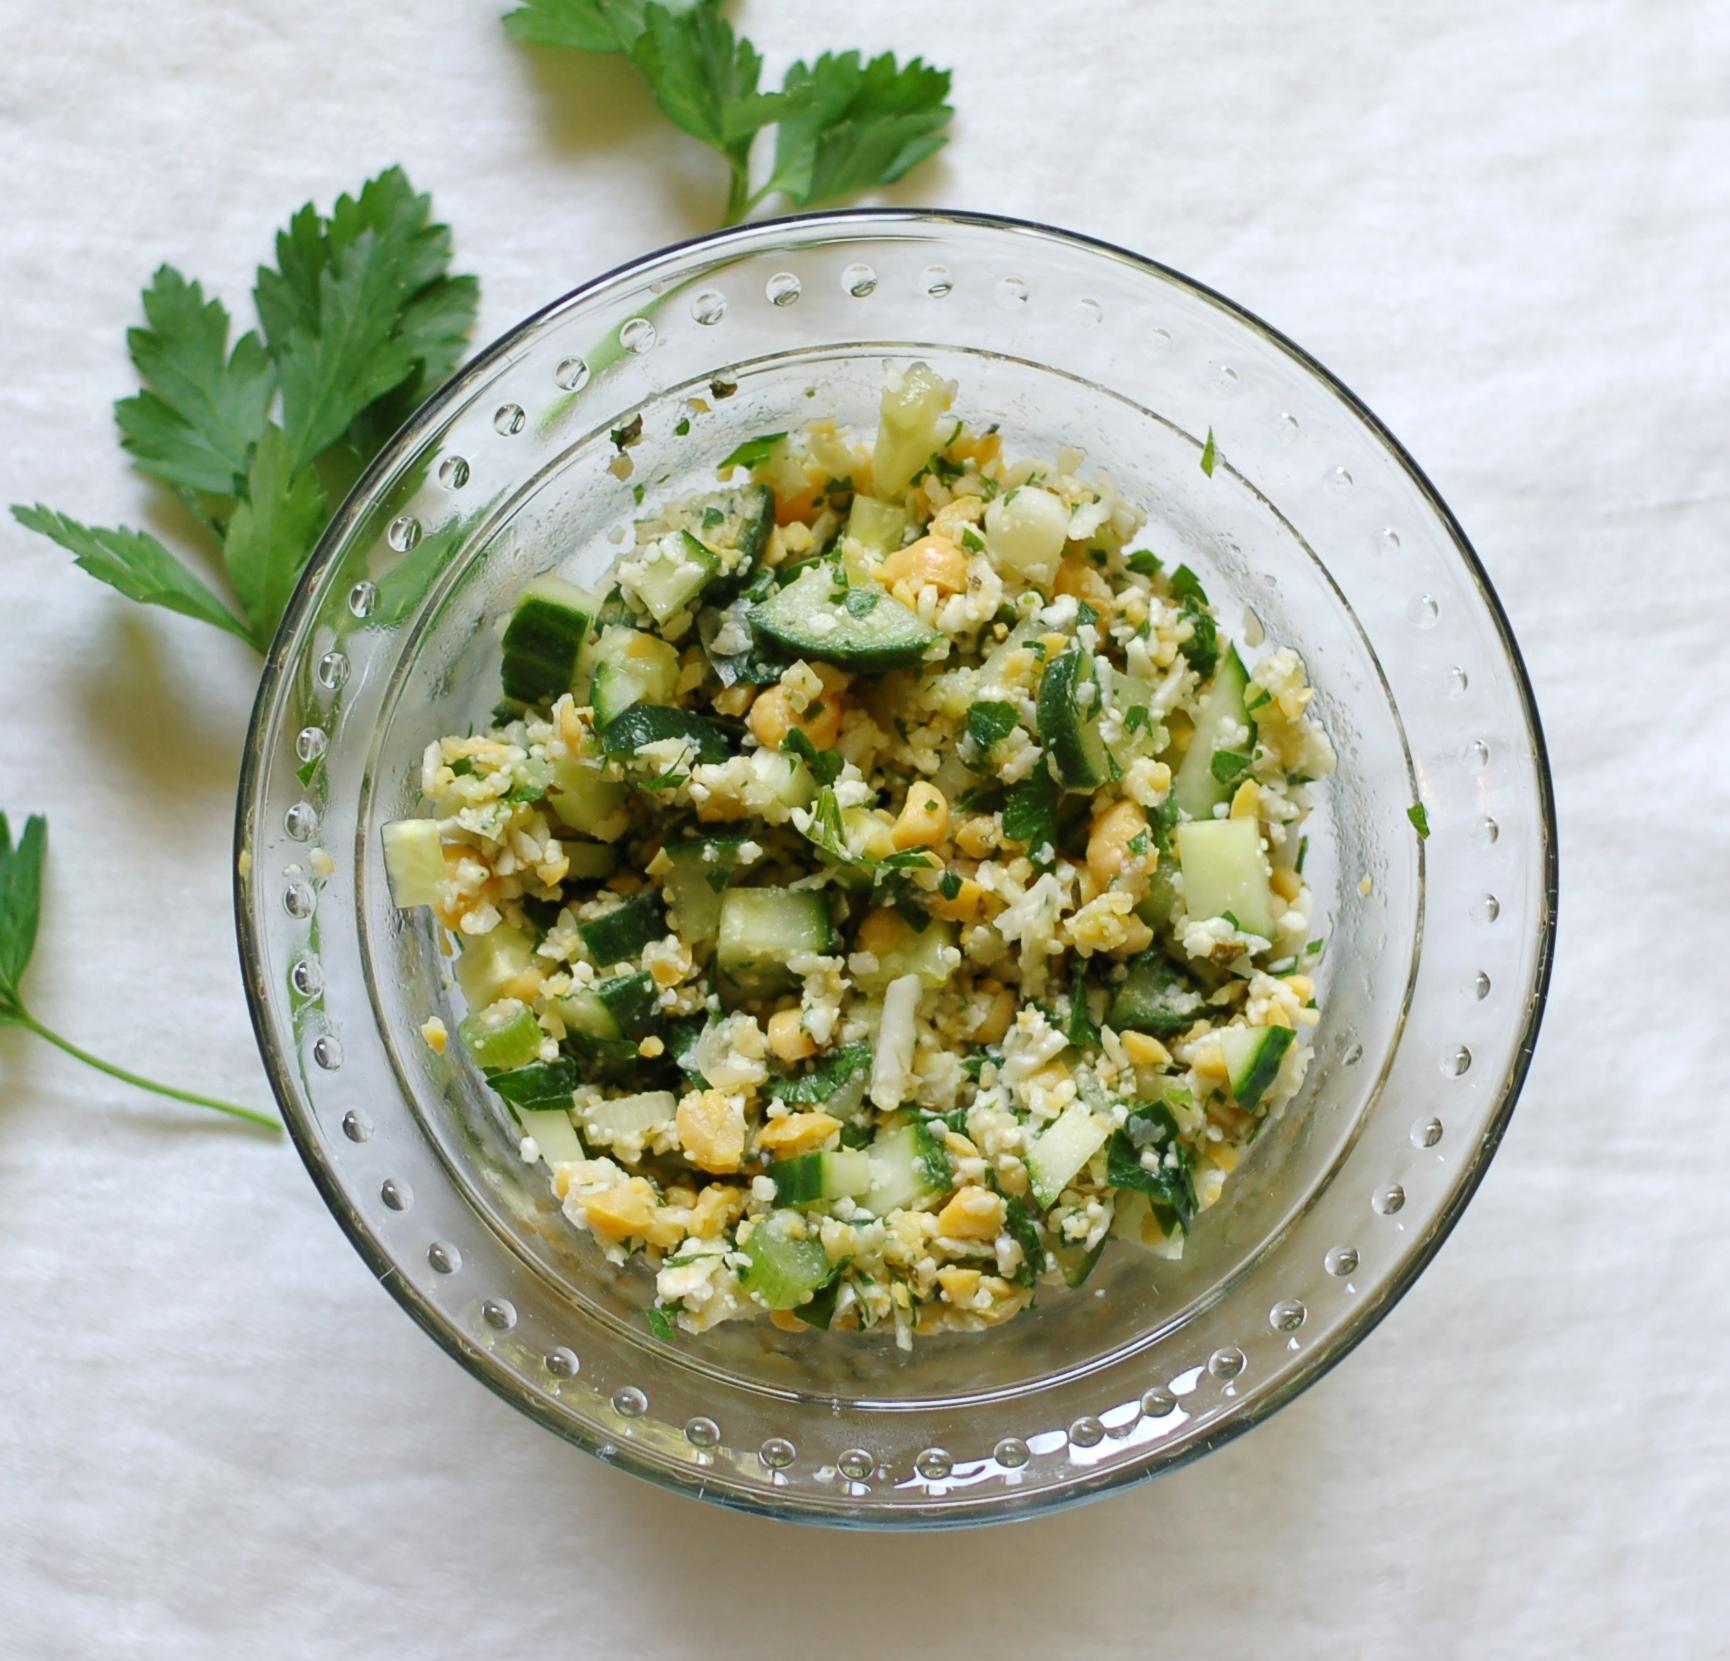 Cauliflower & Chickpea Salad